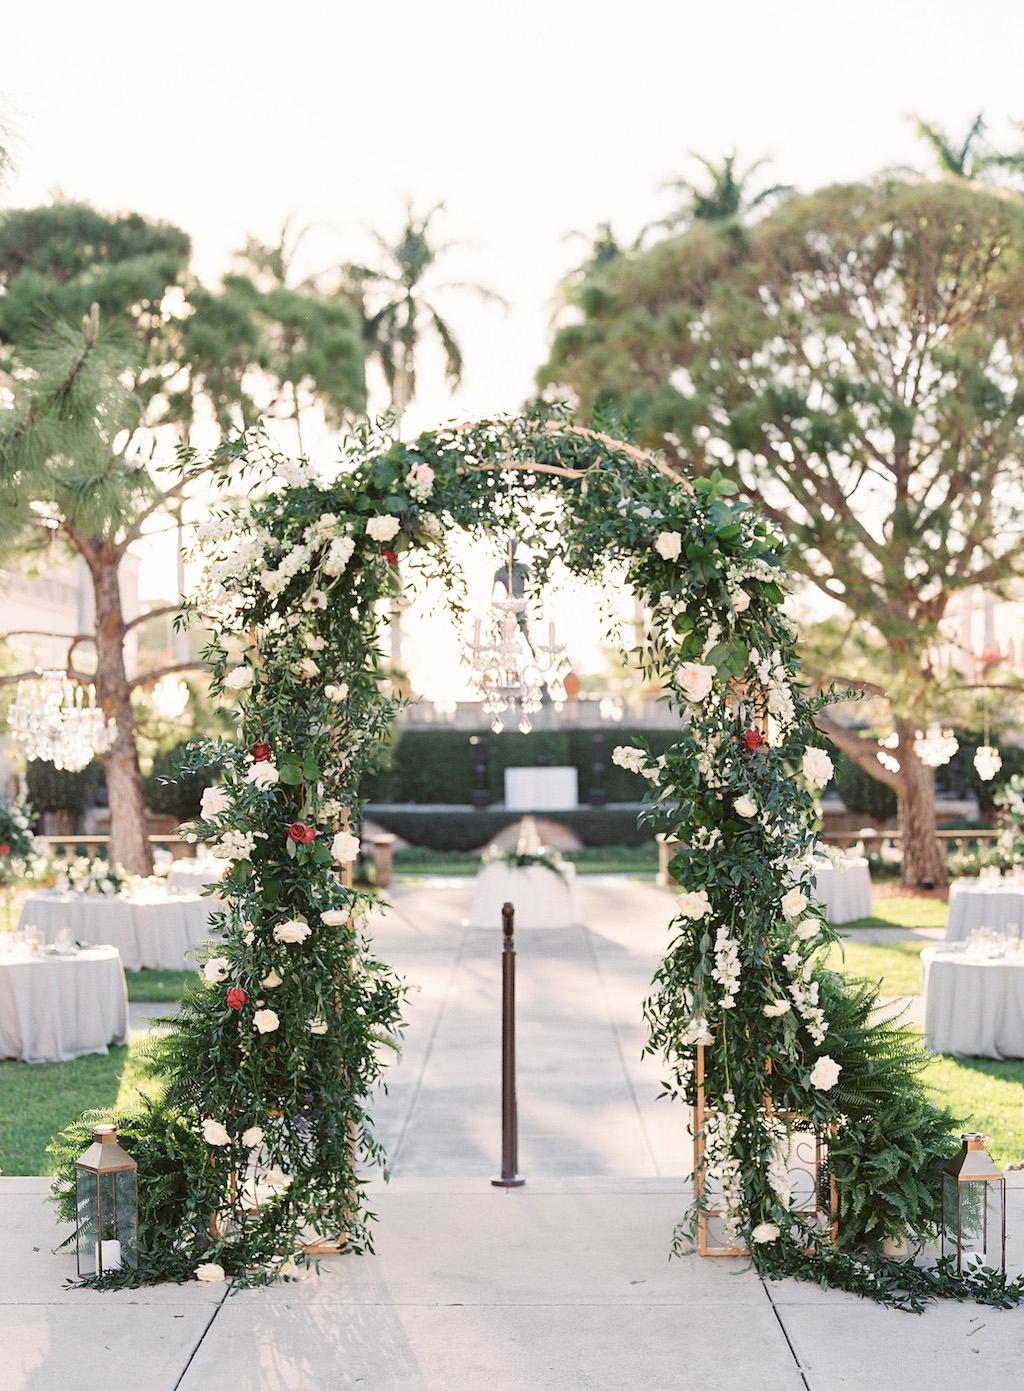 Elegant Modern Garden Courtyard Wedding Ceremony Decor, Greenery, White, Ivory, Red Arch, Gold Candlesticks, Brush Gold Lanterns | Sarasota Wedding Venue Ringling Museum | Tampa Bay Wedding Planner NK Weddings